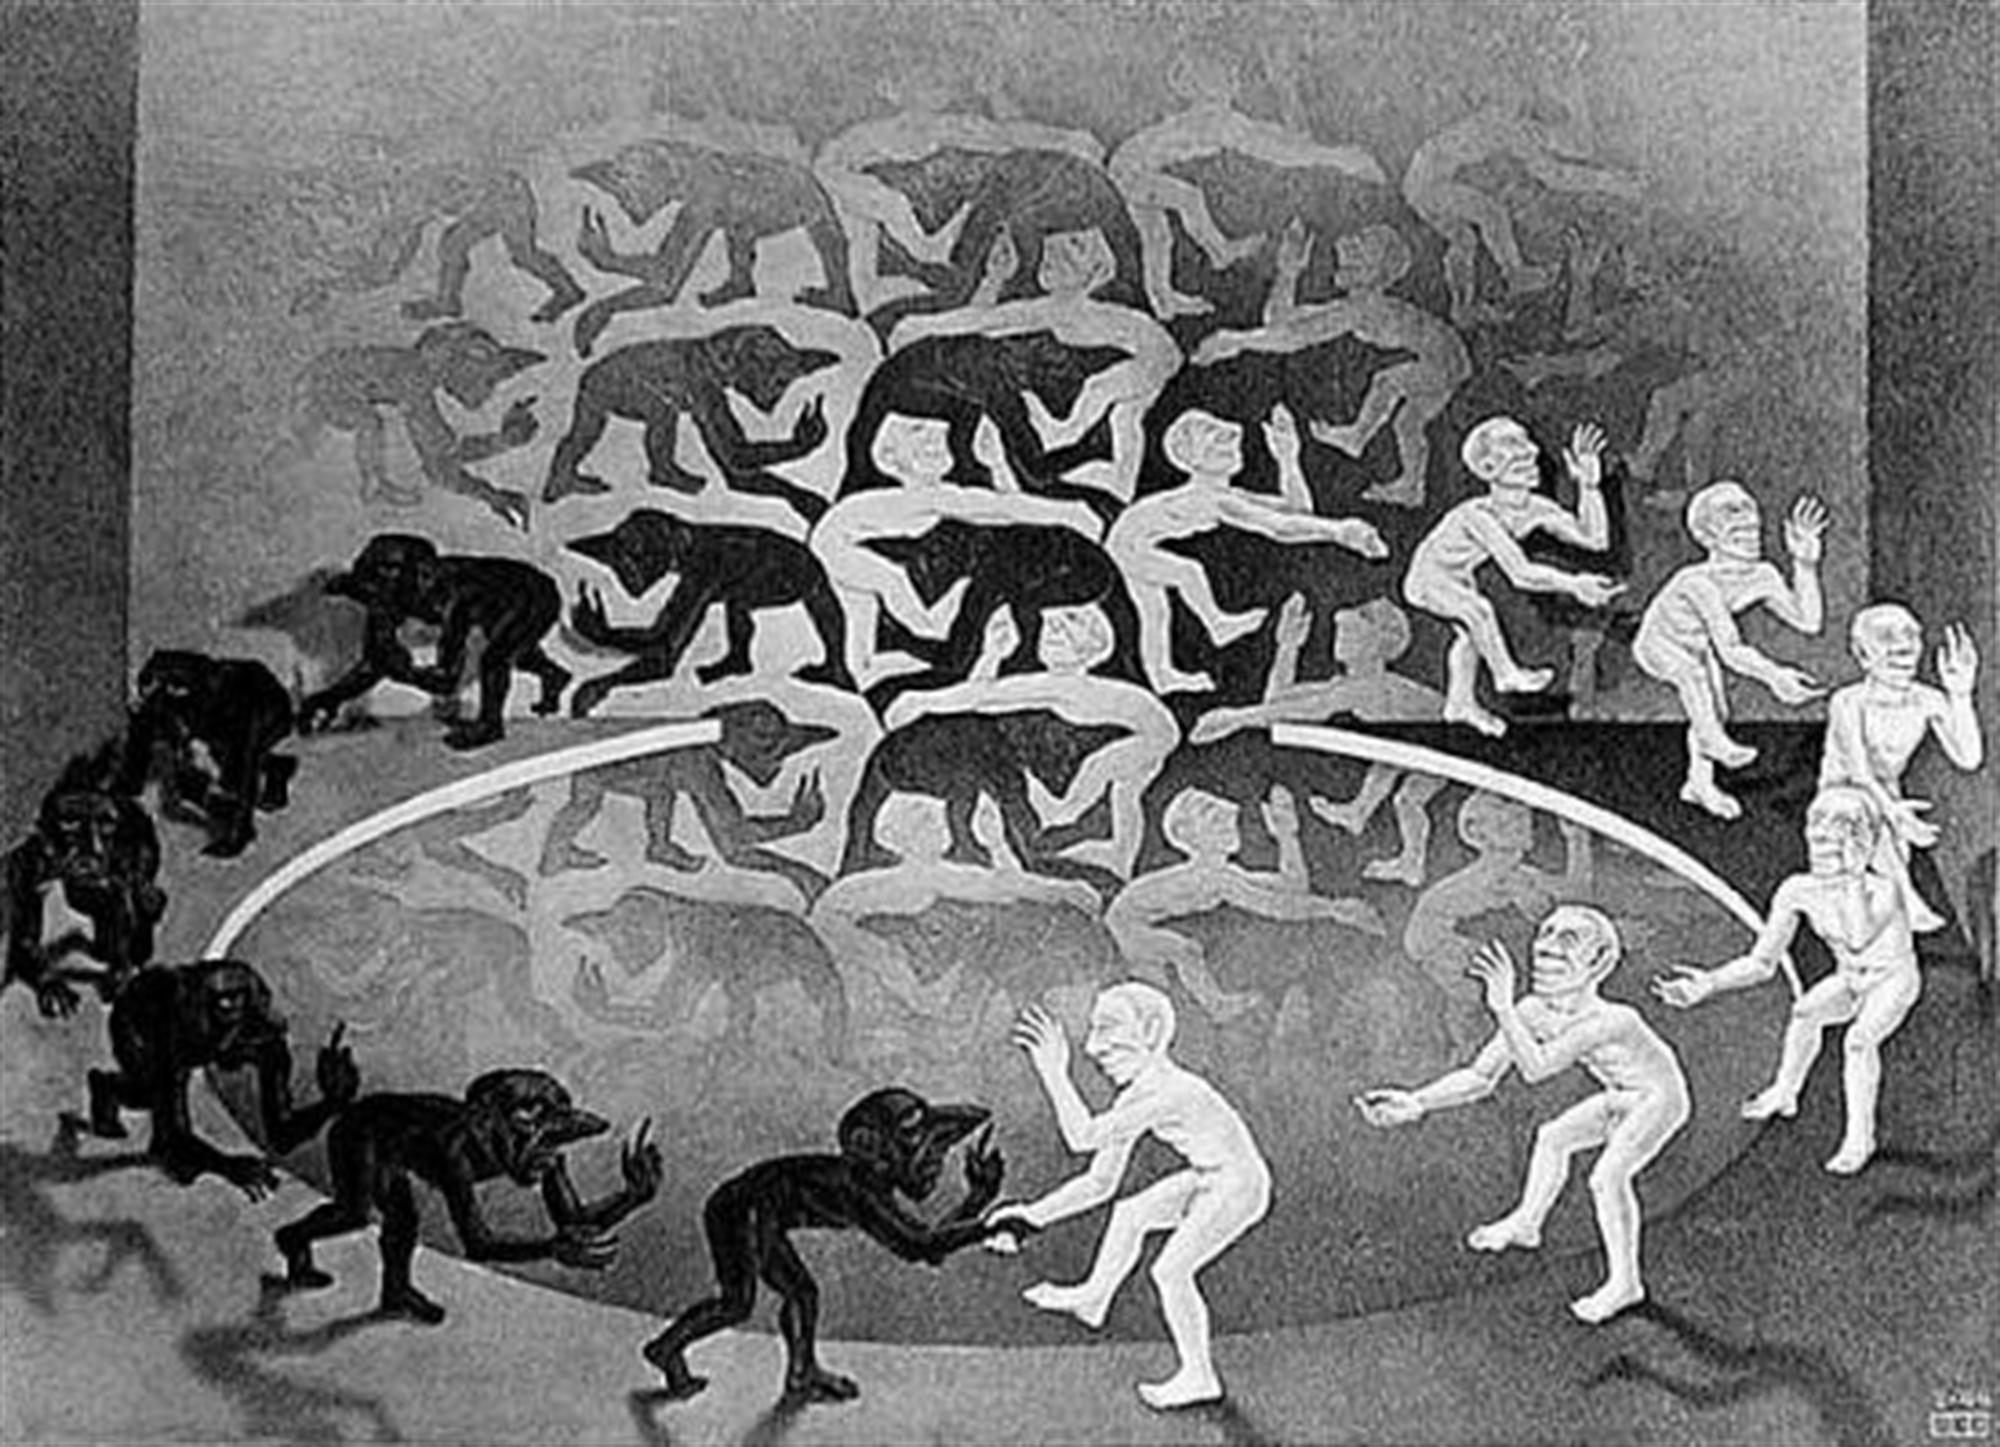 Encounter by M.C. Escher